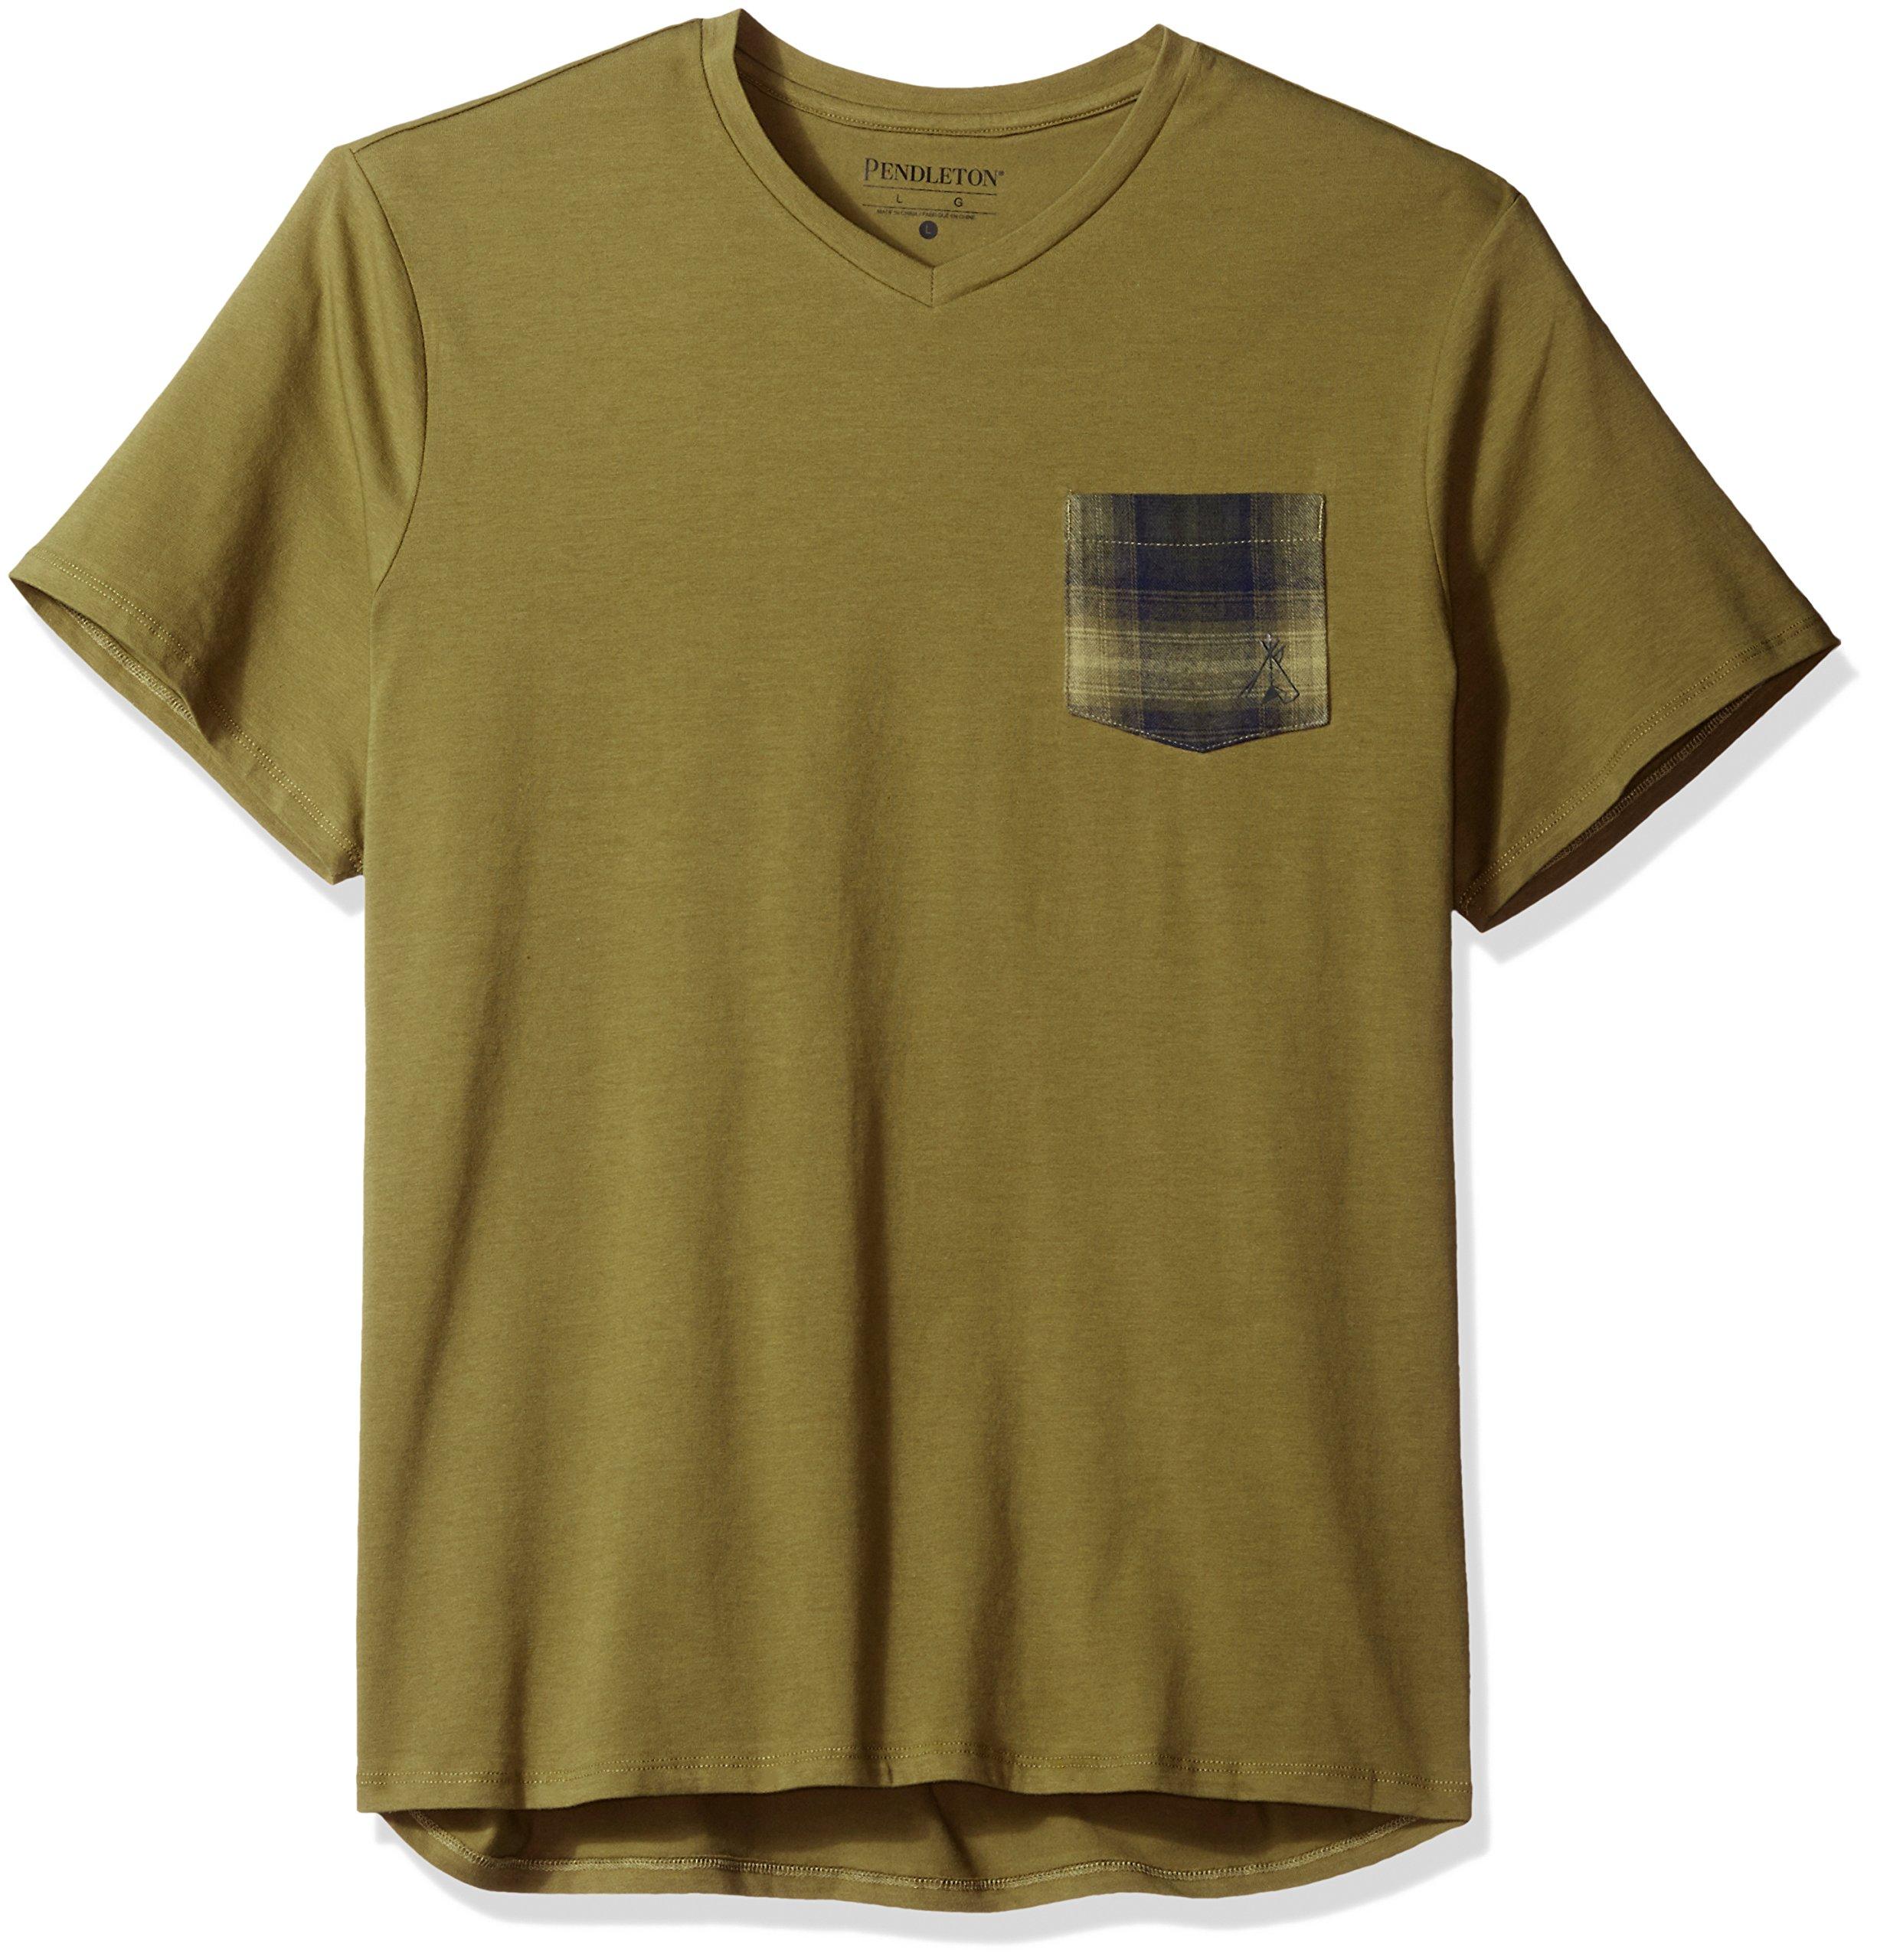 Pendleton Men's Short Sleeve Pocket Tee, Olive, Large